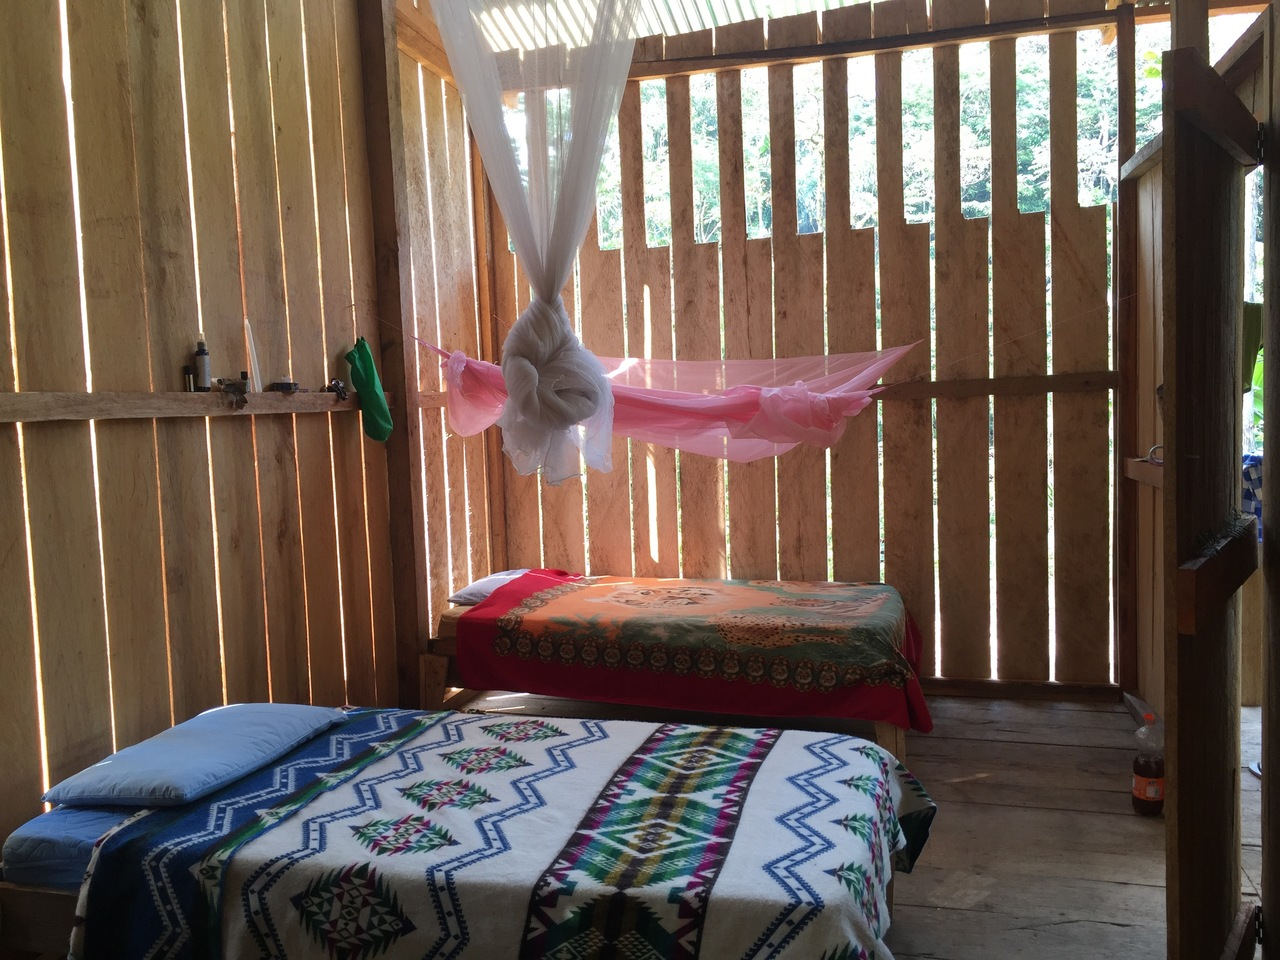 Pasourcu: Napusamai Ayahuasca Lodge